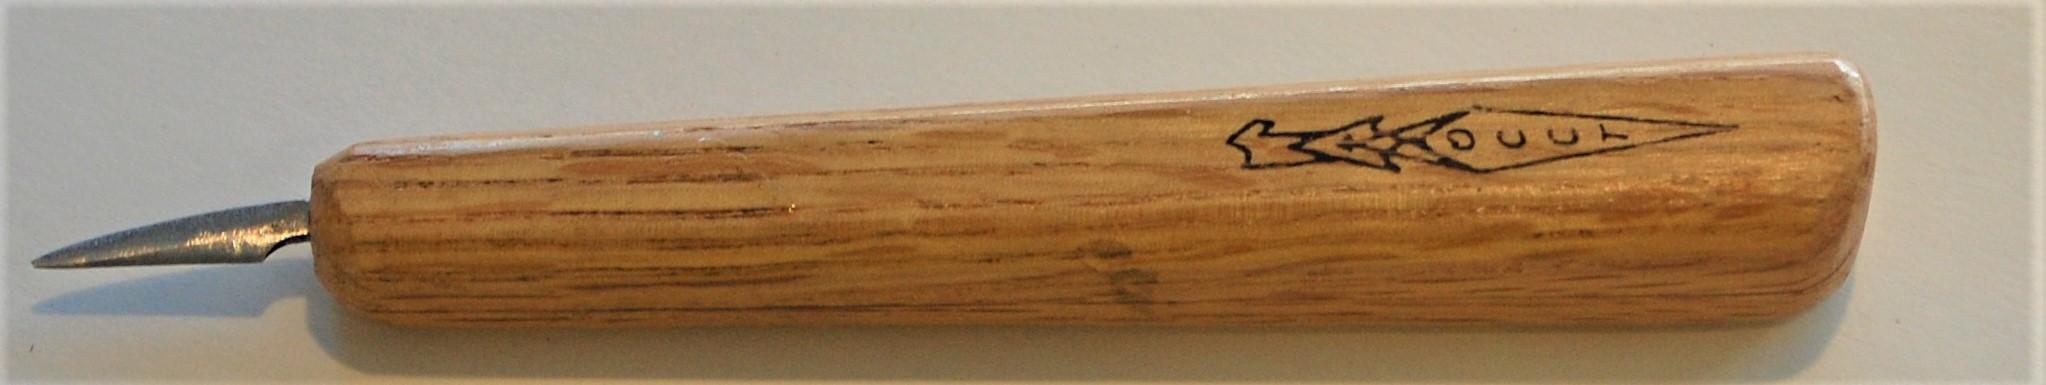 "Beginners Carving 1/2"" Mini Detail Knife."